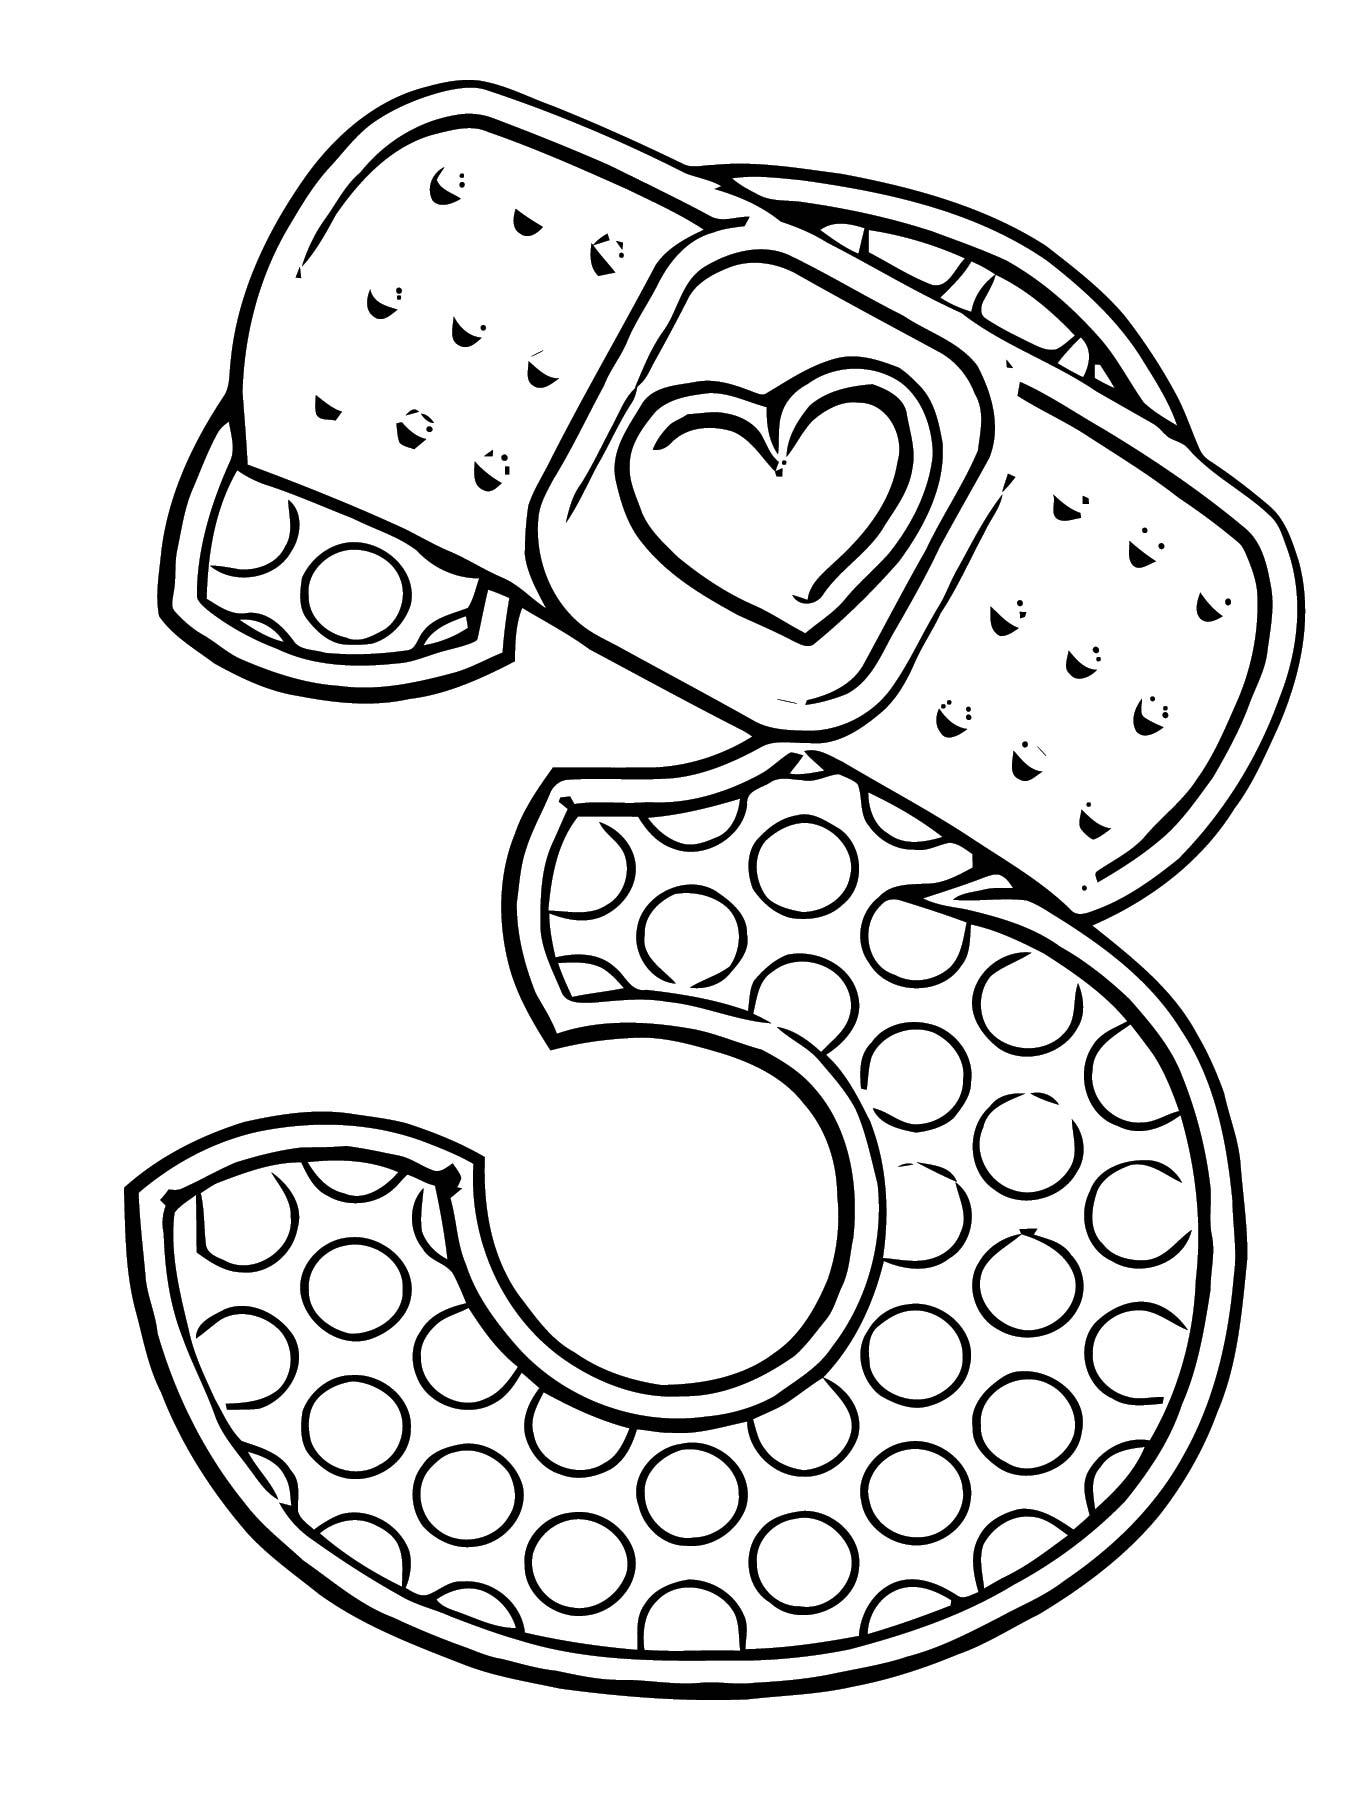 Doc Mcstuffins 3 Number Coloring Page